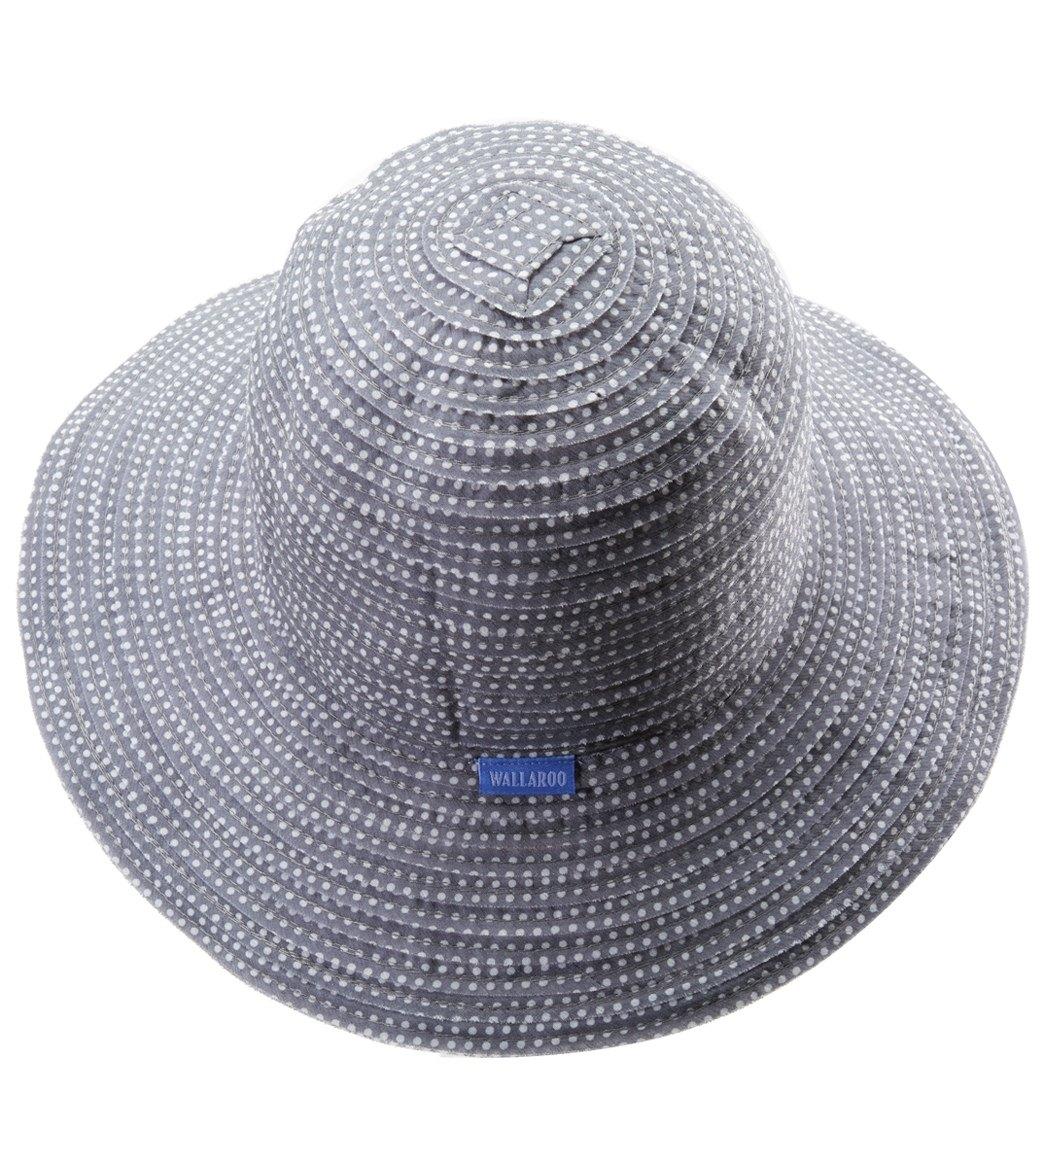 e933a8bcf68 Wallaroo Women s Petite Scrunchie Hat at SwimOutlet.com